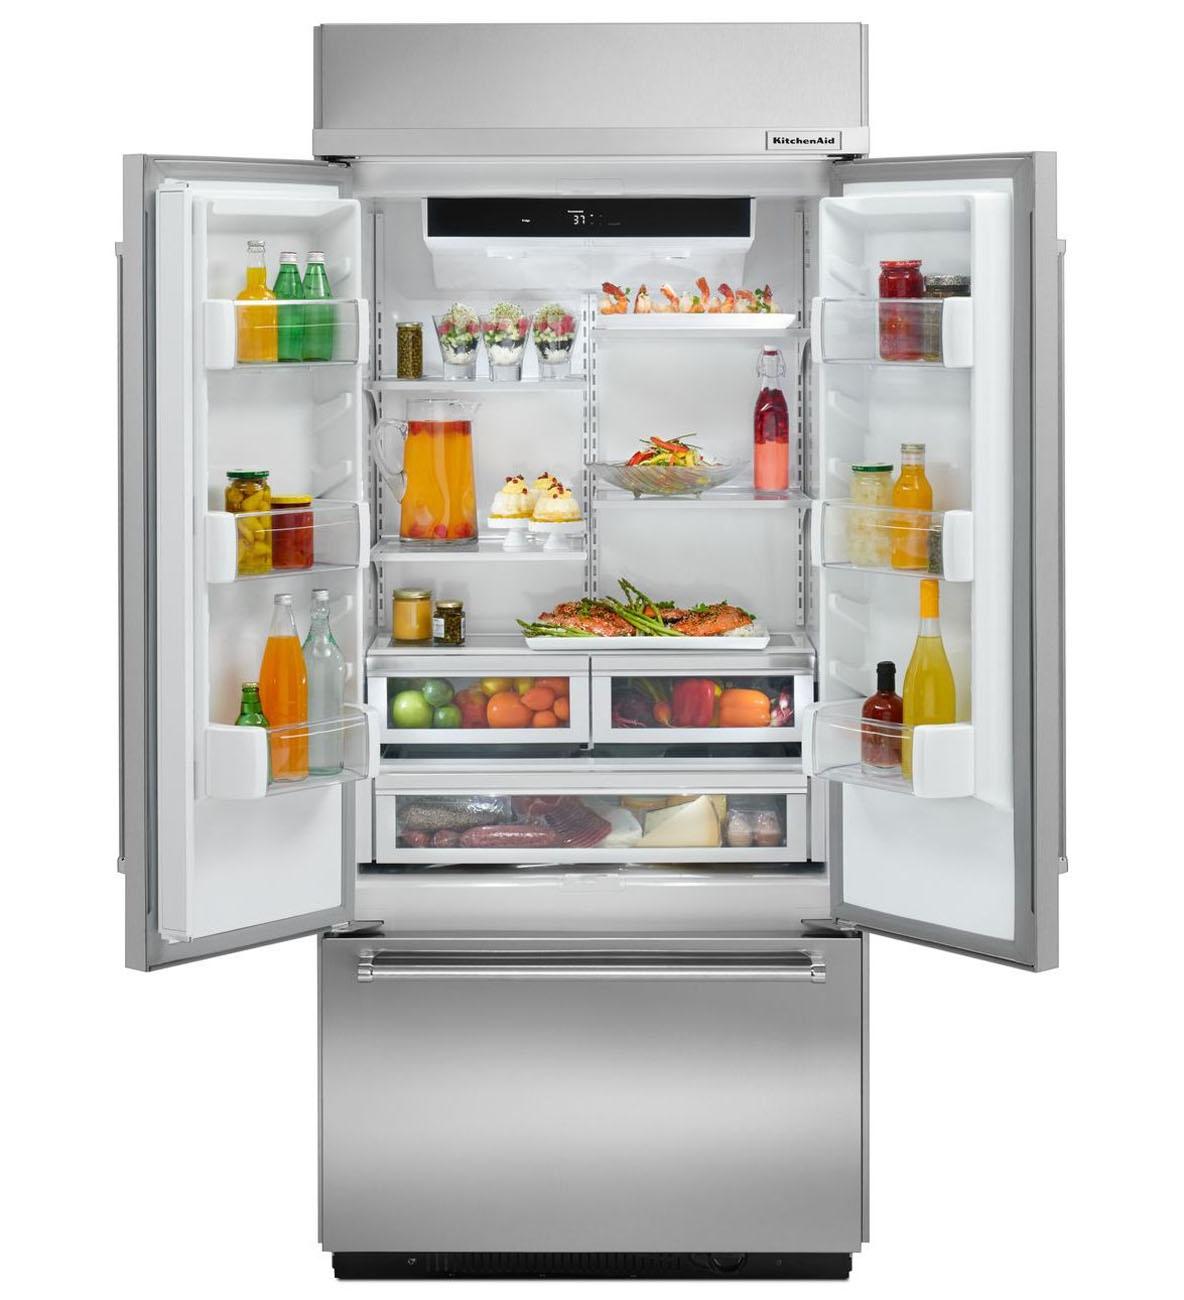 KitchenAid Built-In Stainless Refrigerator - KBFN406ESS